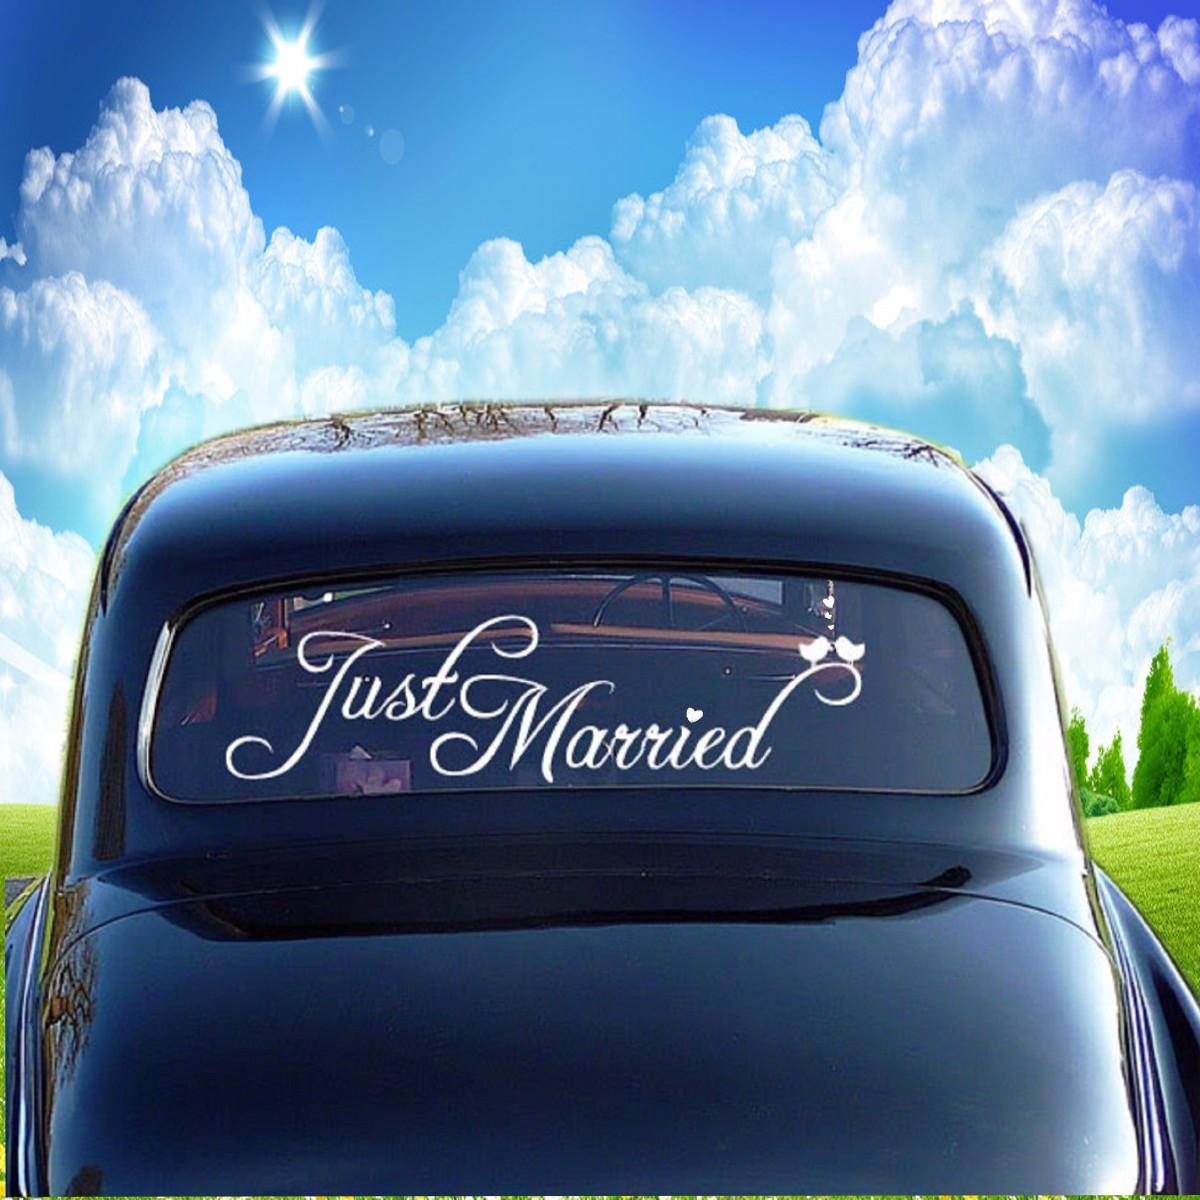 Just Married Wedding Car Window Banner PVC Waterproof Sticker Decal Vinyl Personalised Decor Car Decoration Wedding Supplies